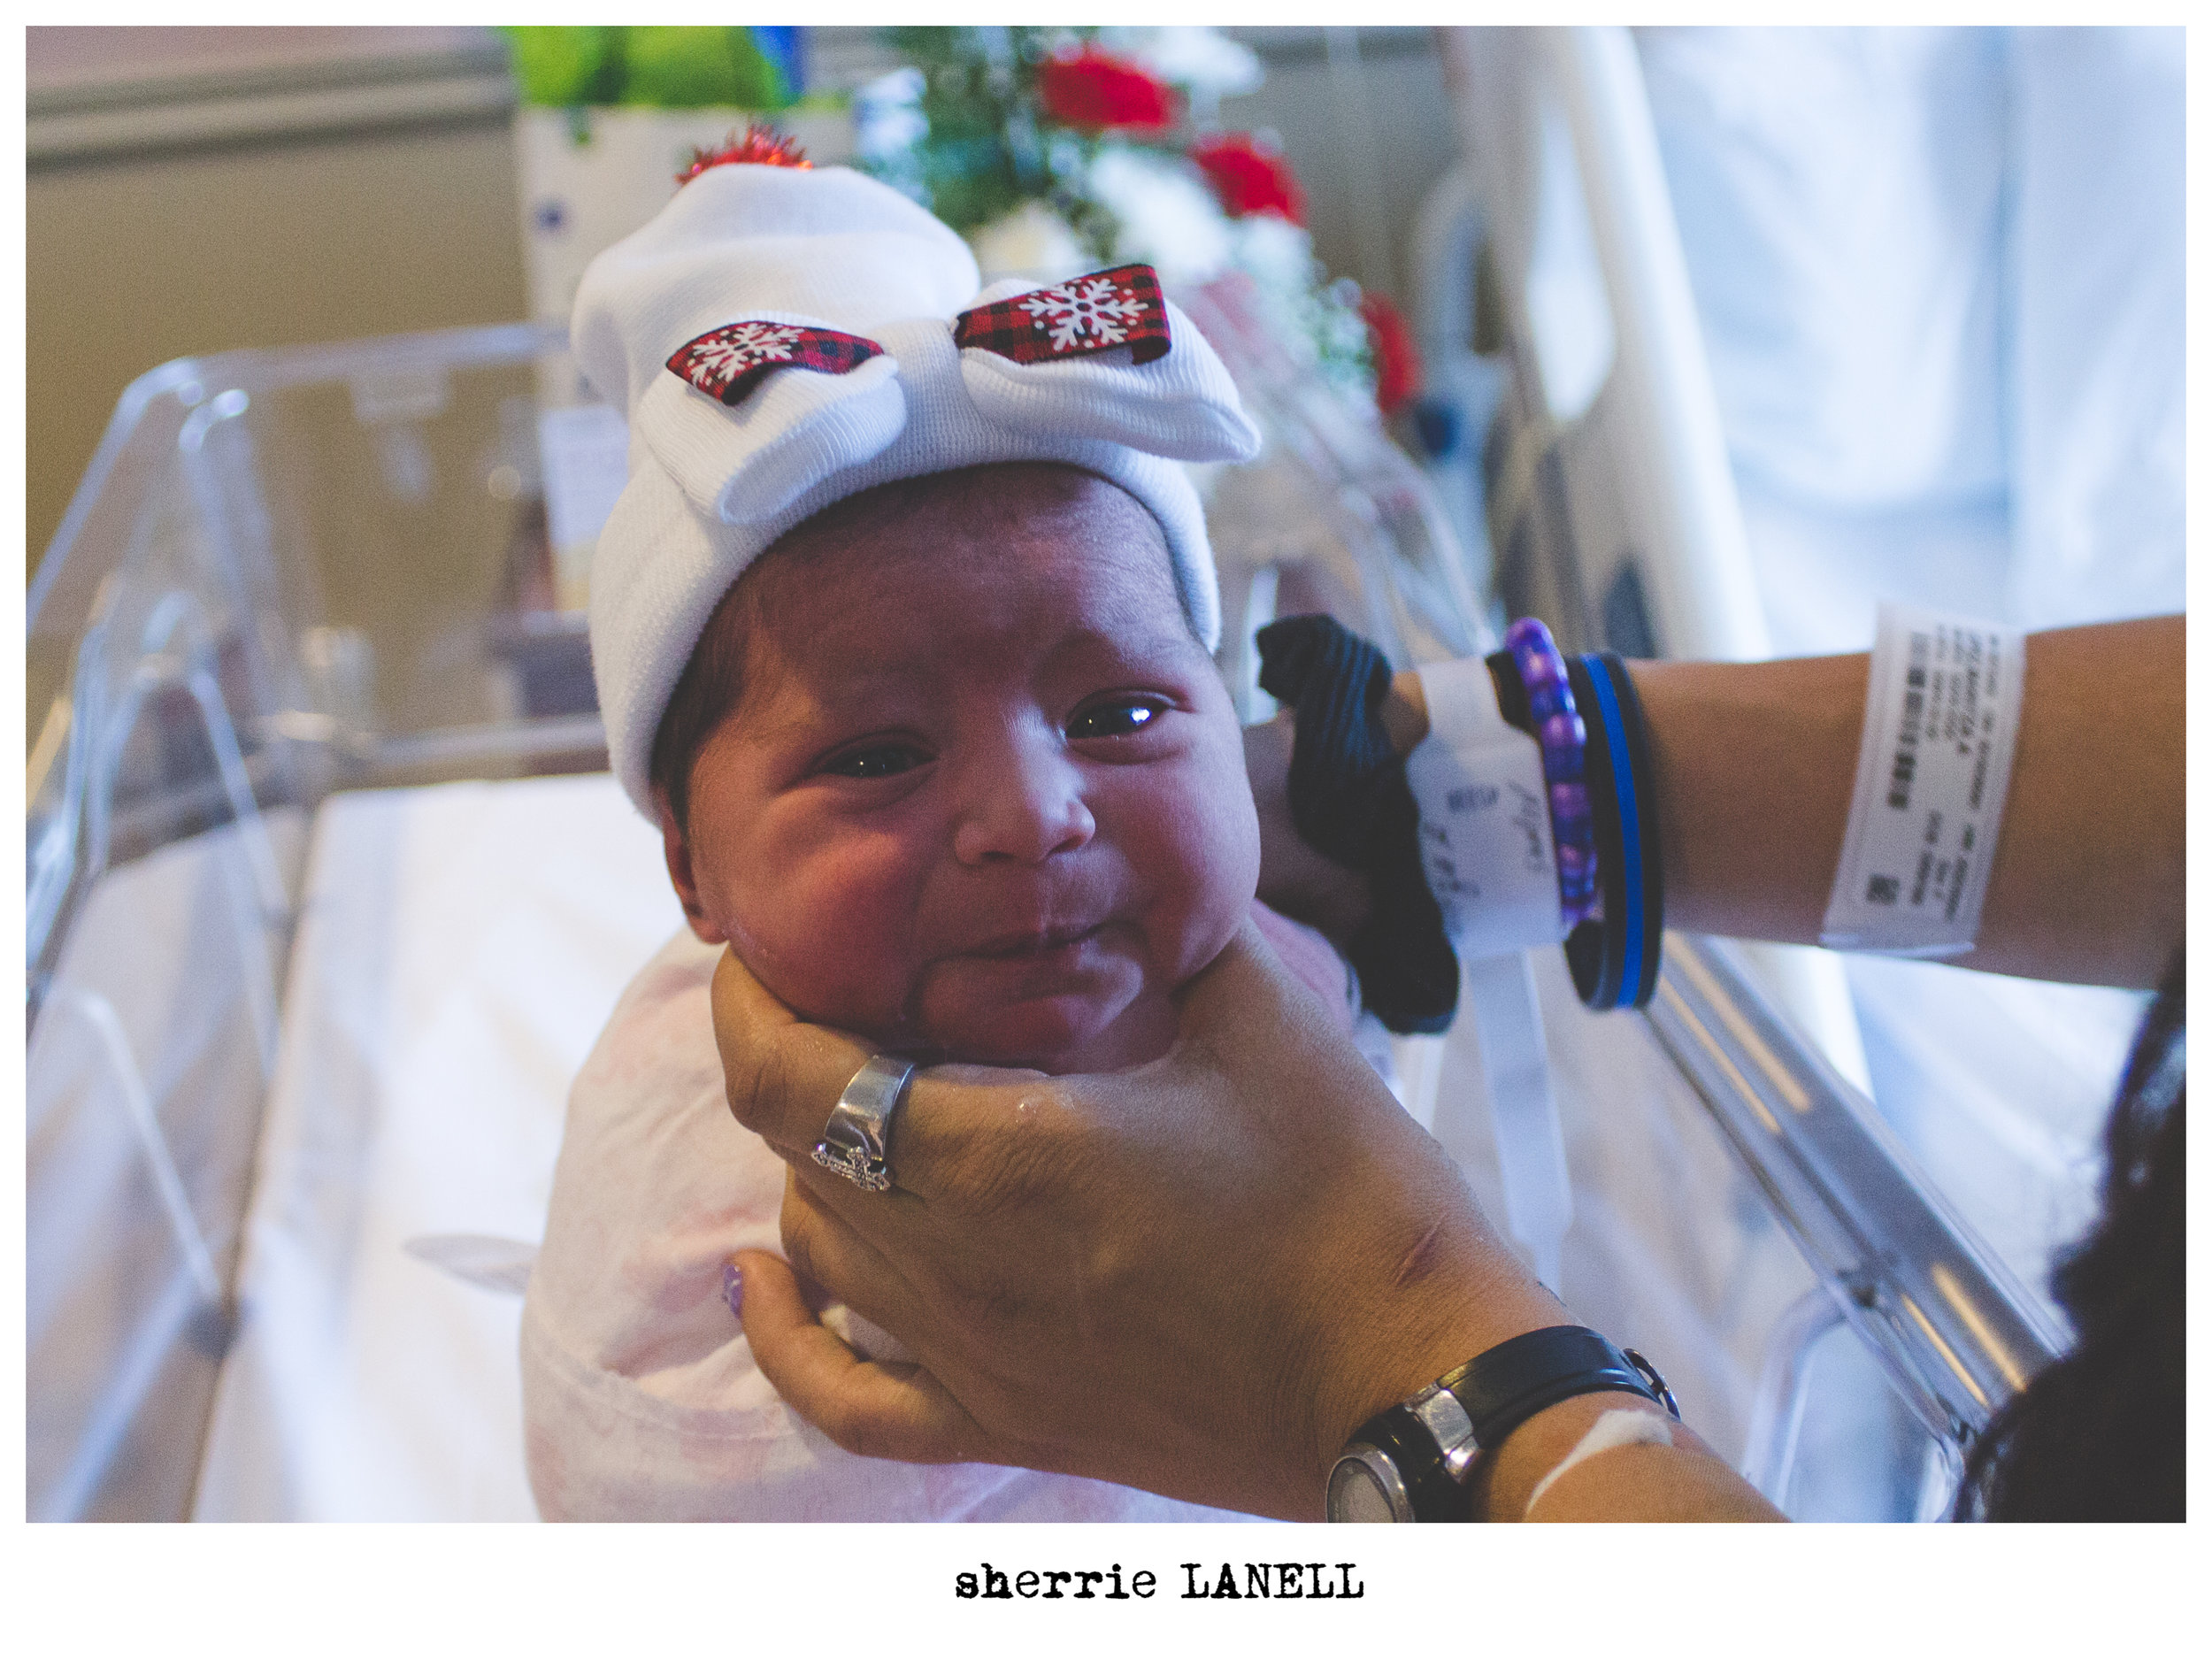 Sherrie Lanell - New Jersey Documentary Newborn Photographer 3.jpg